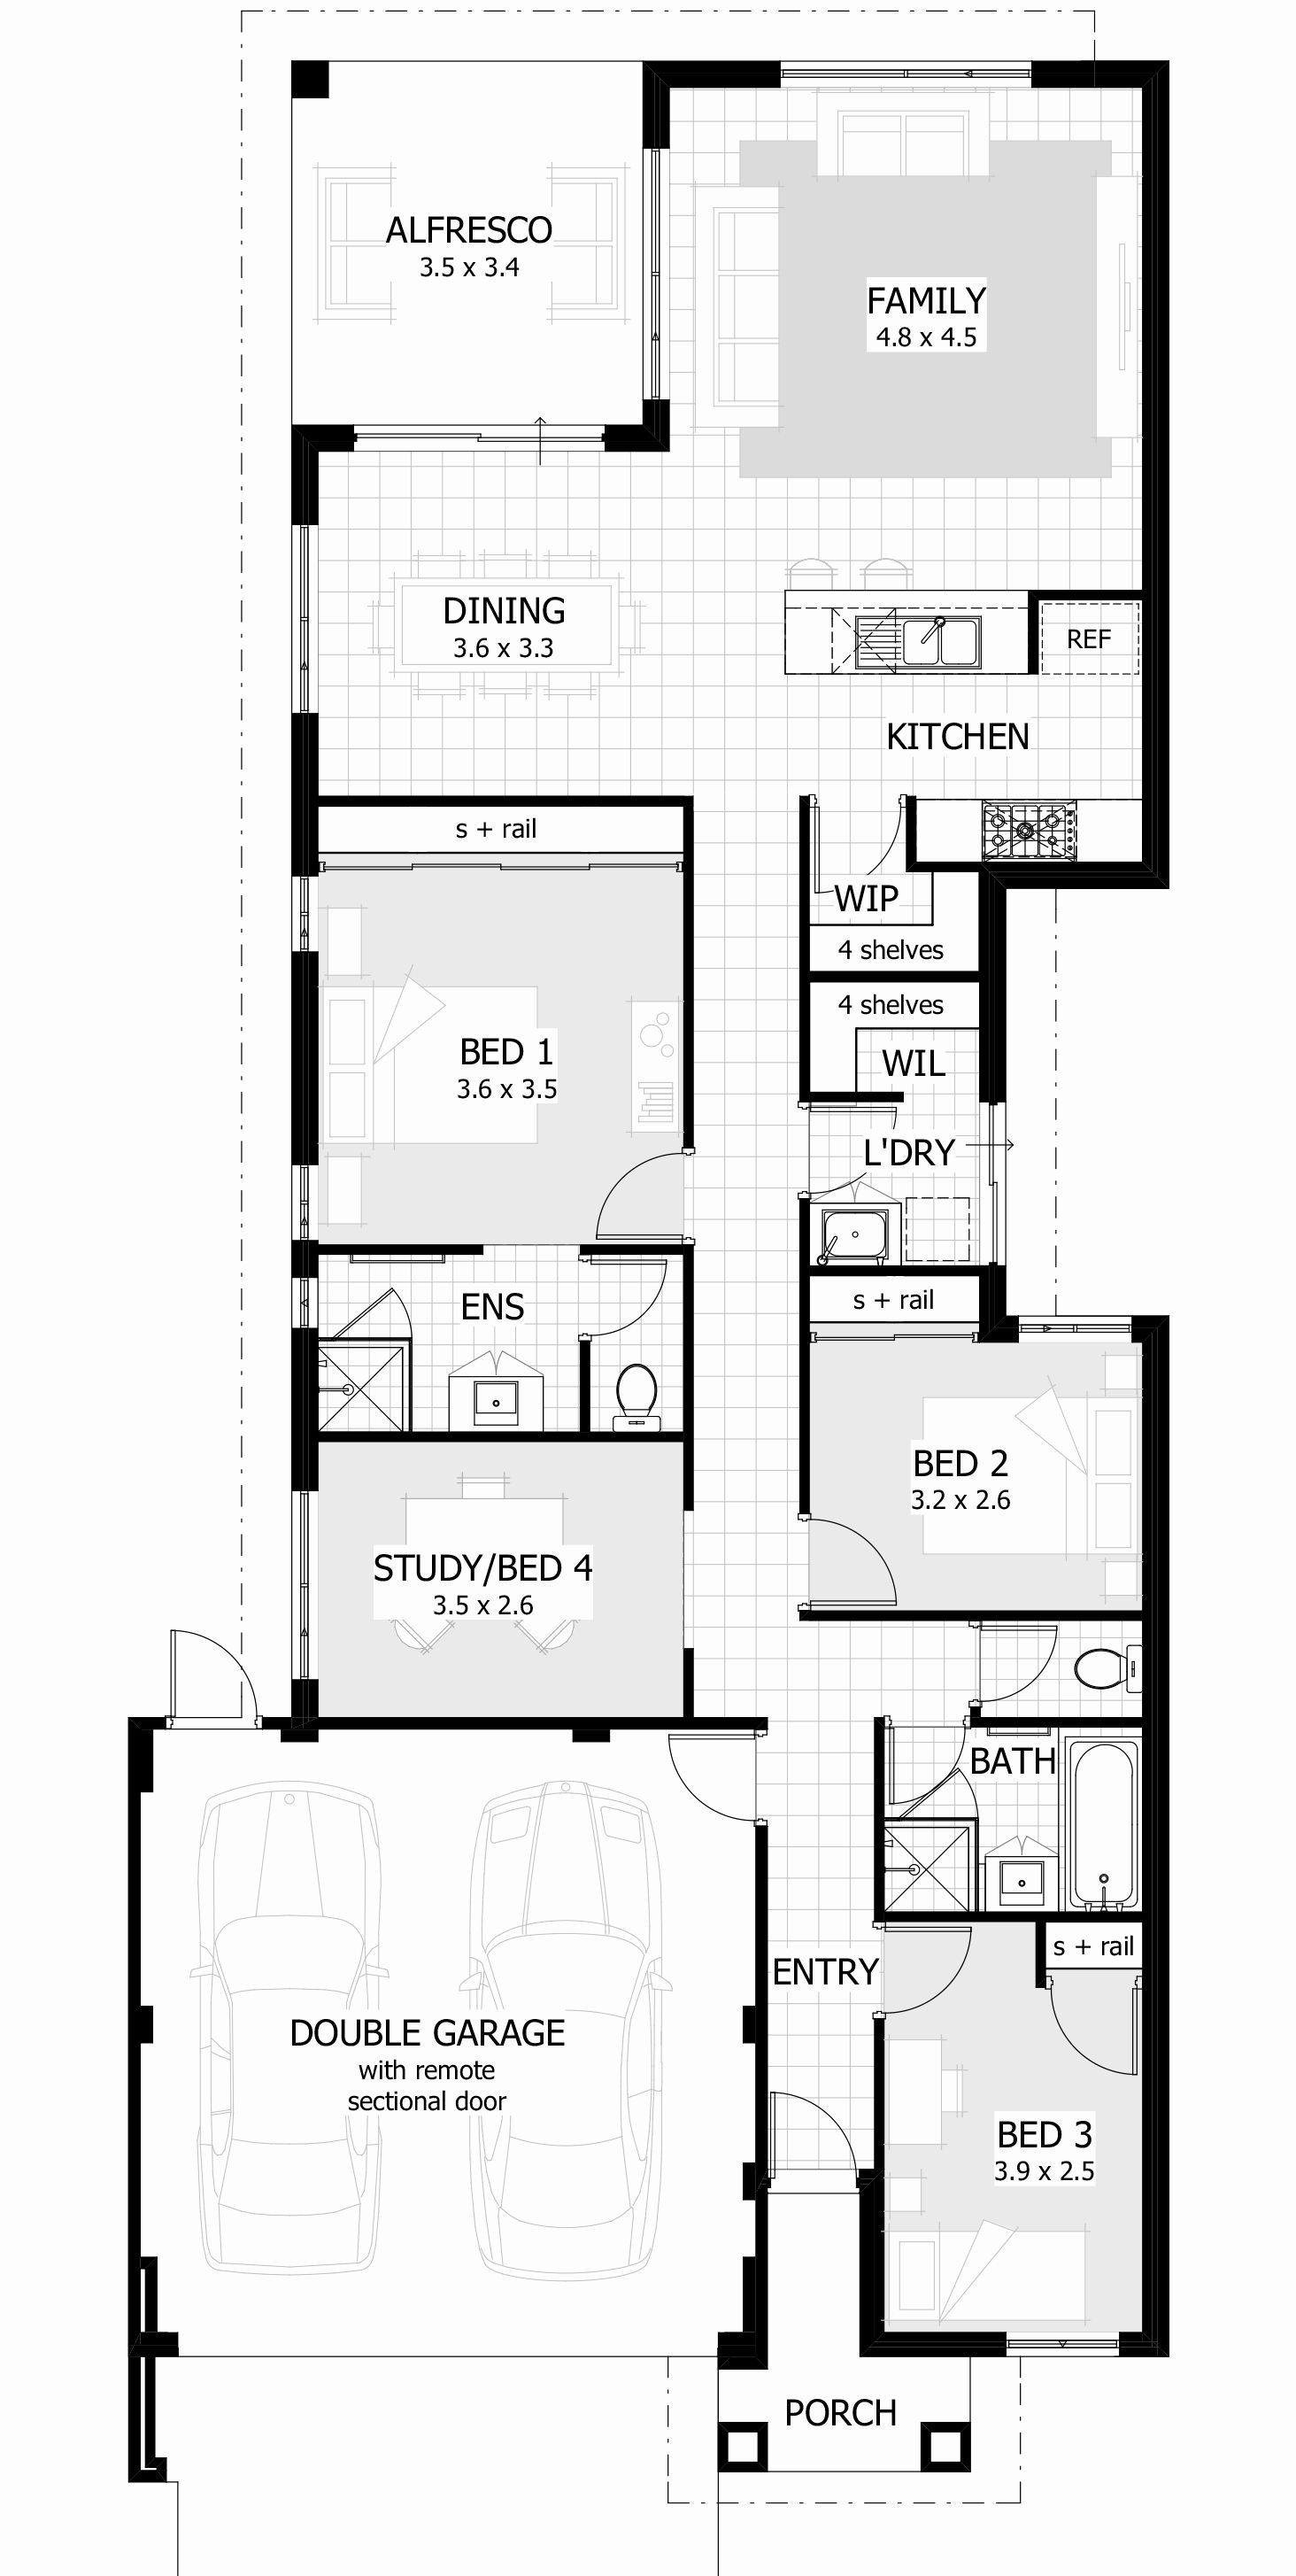 Narrow Lot One Story House Plans Narrow House Plans House Plans Australia Single Storey House Plans